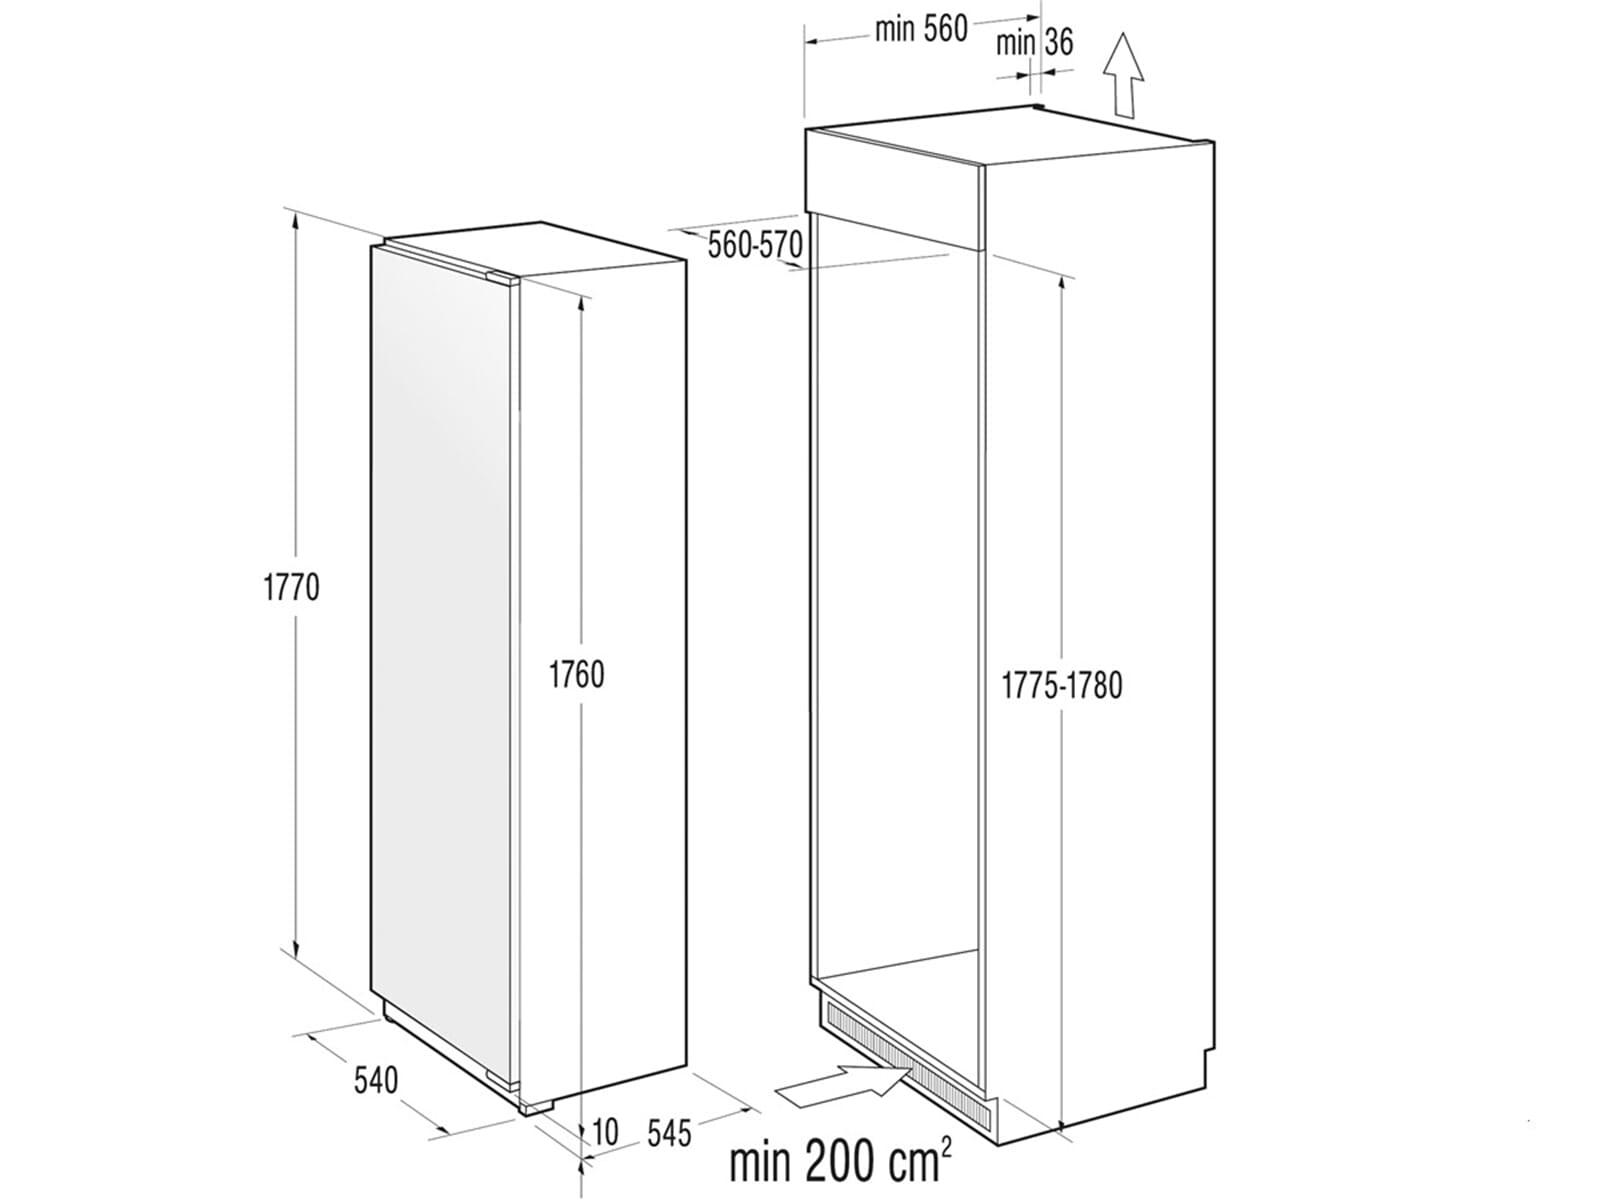 gorenje rbi 5182 bw einbau k hlschrank 3838942708312 ebay. Black Bedroom Furniture Sets. Home Design Ideas